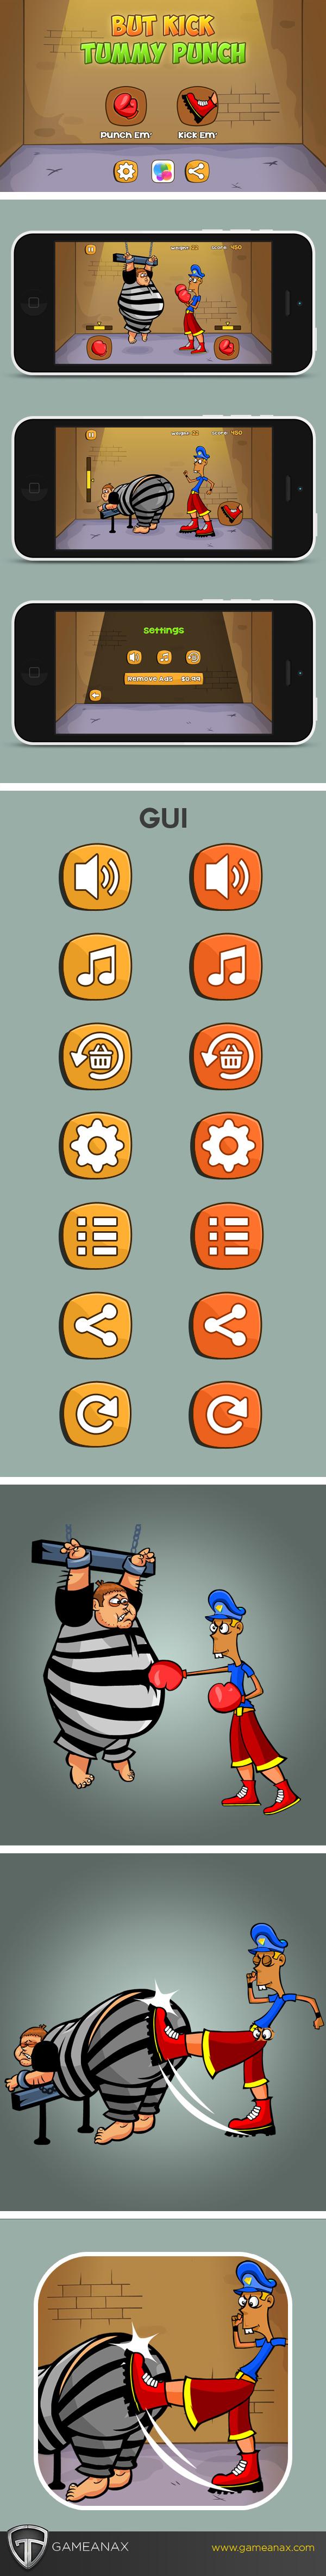 UI ux Character iphone iPad funny Games game mobile gaming Gaming